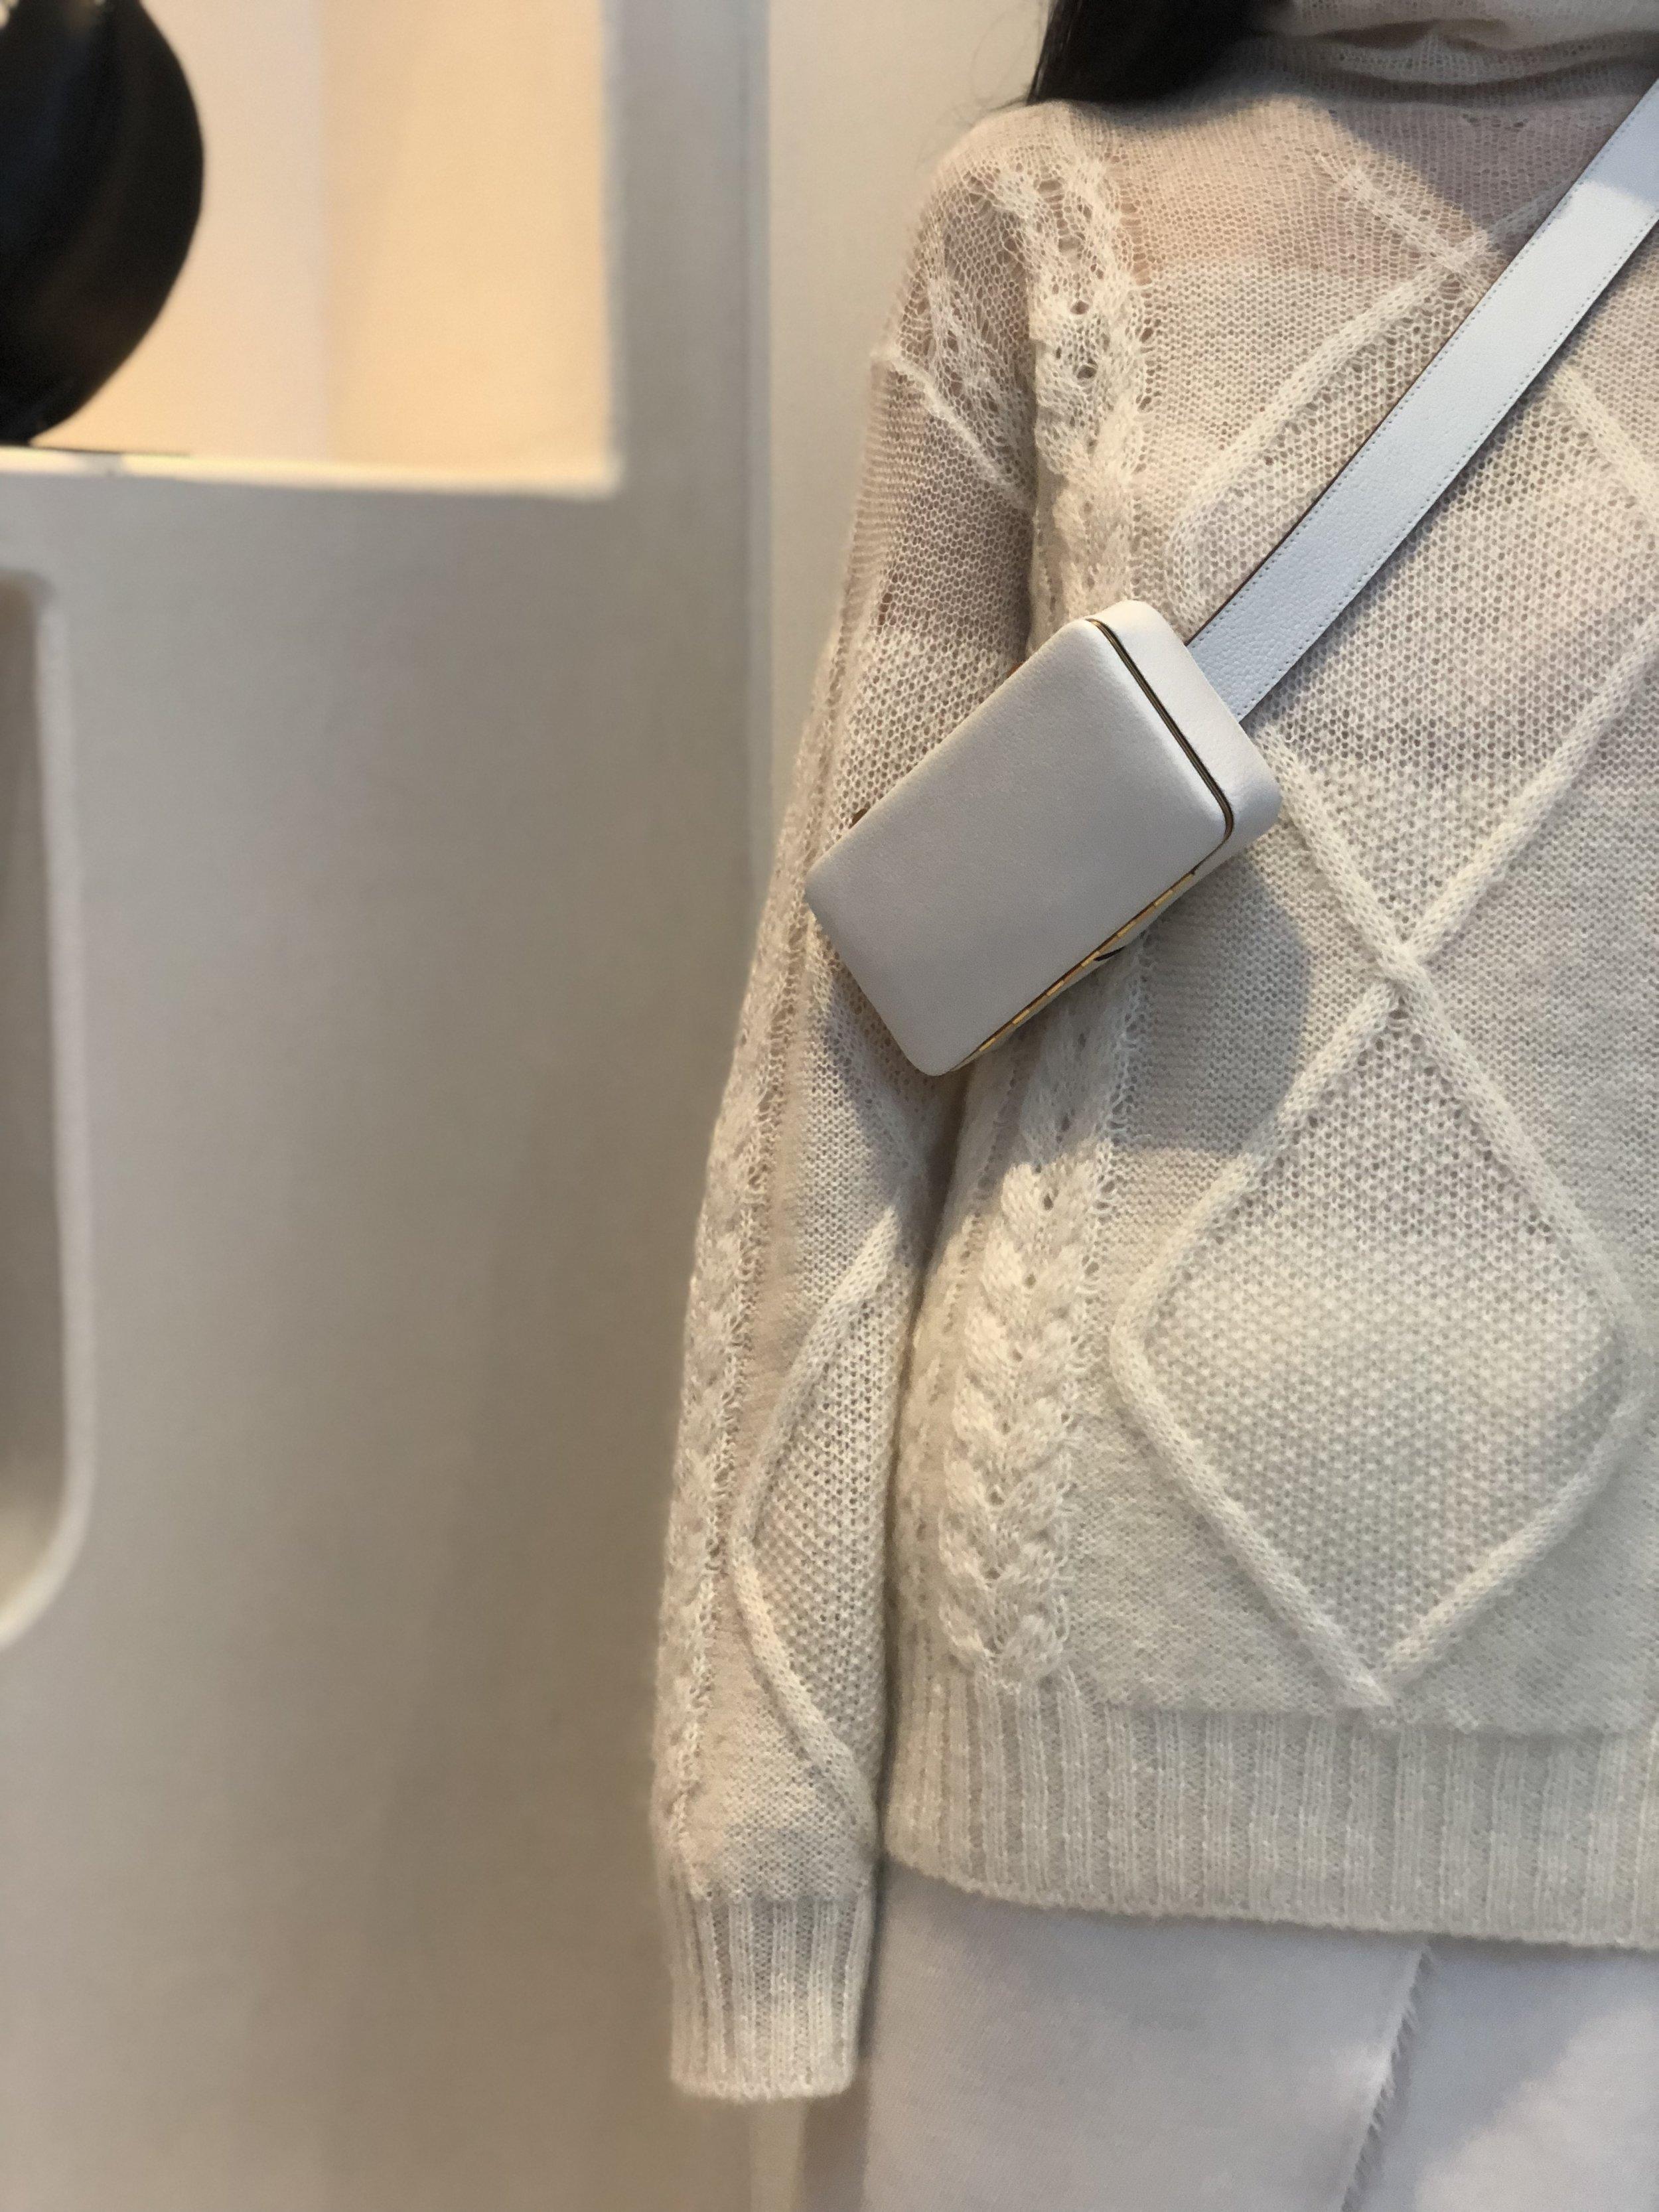 Brand spankin' new bag by Lutz Morris. Nice pick Sihan!